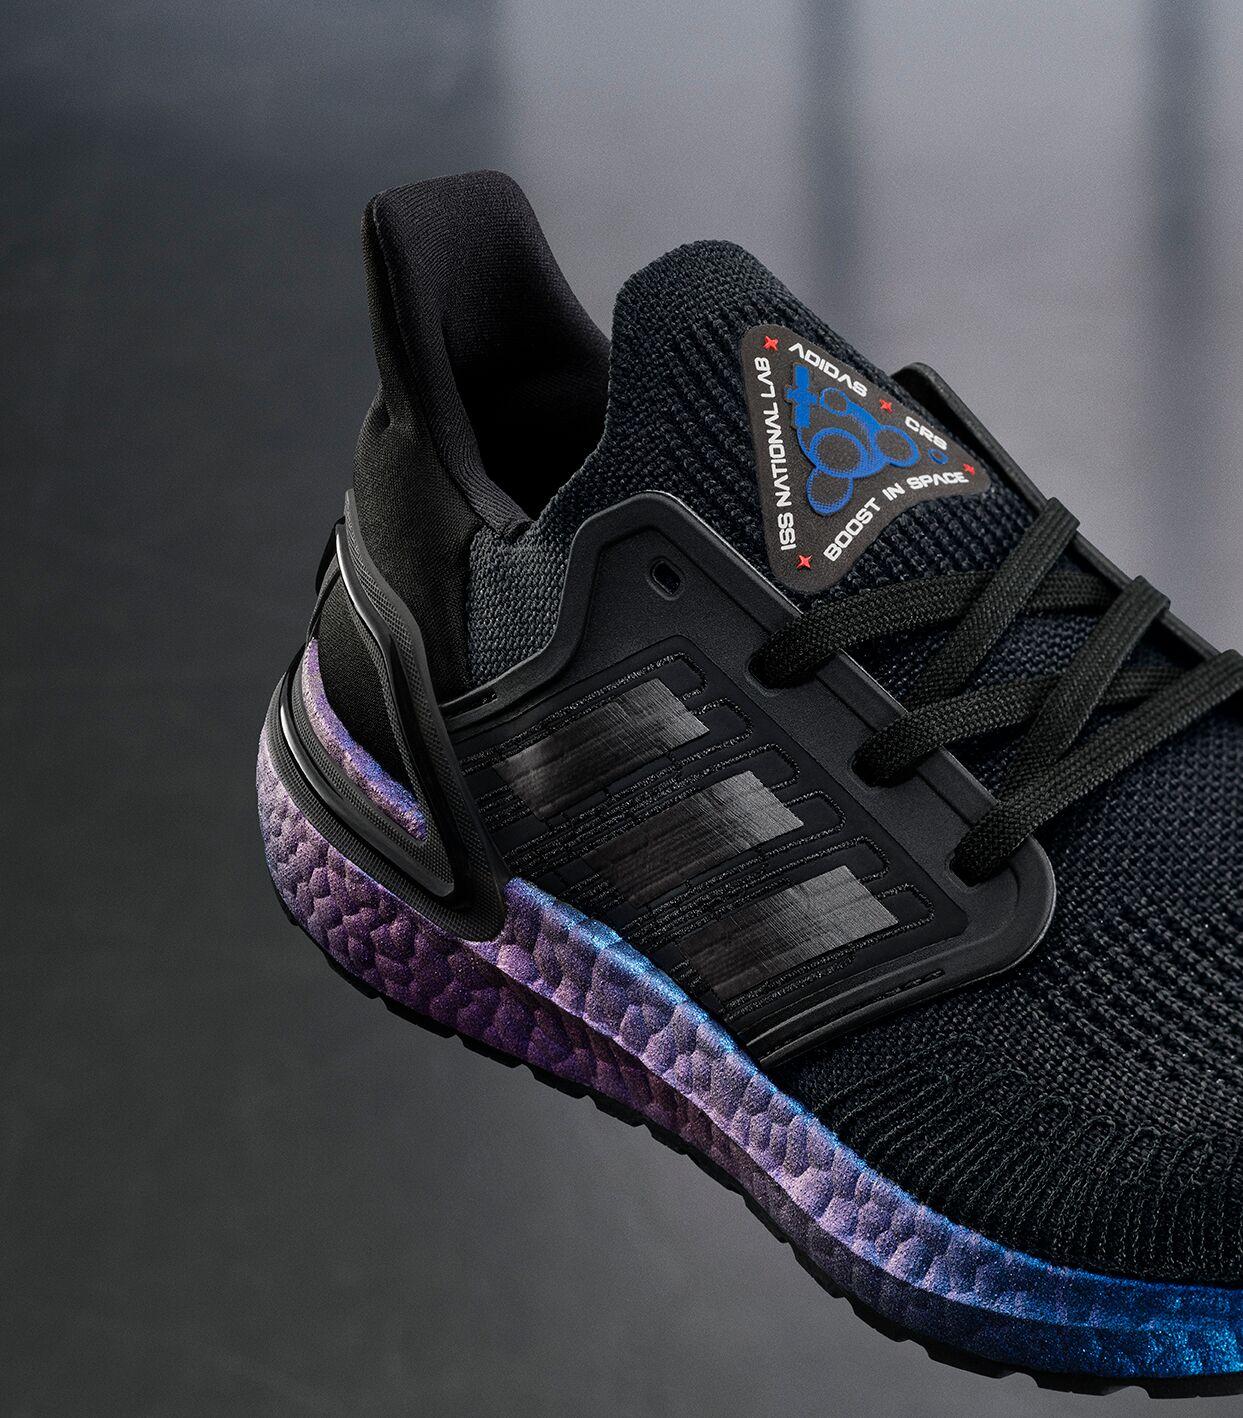 adidas-ultraboost-20-chaussures-running-runpack-3